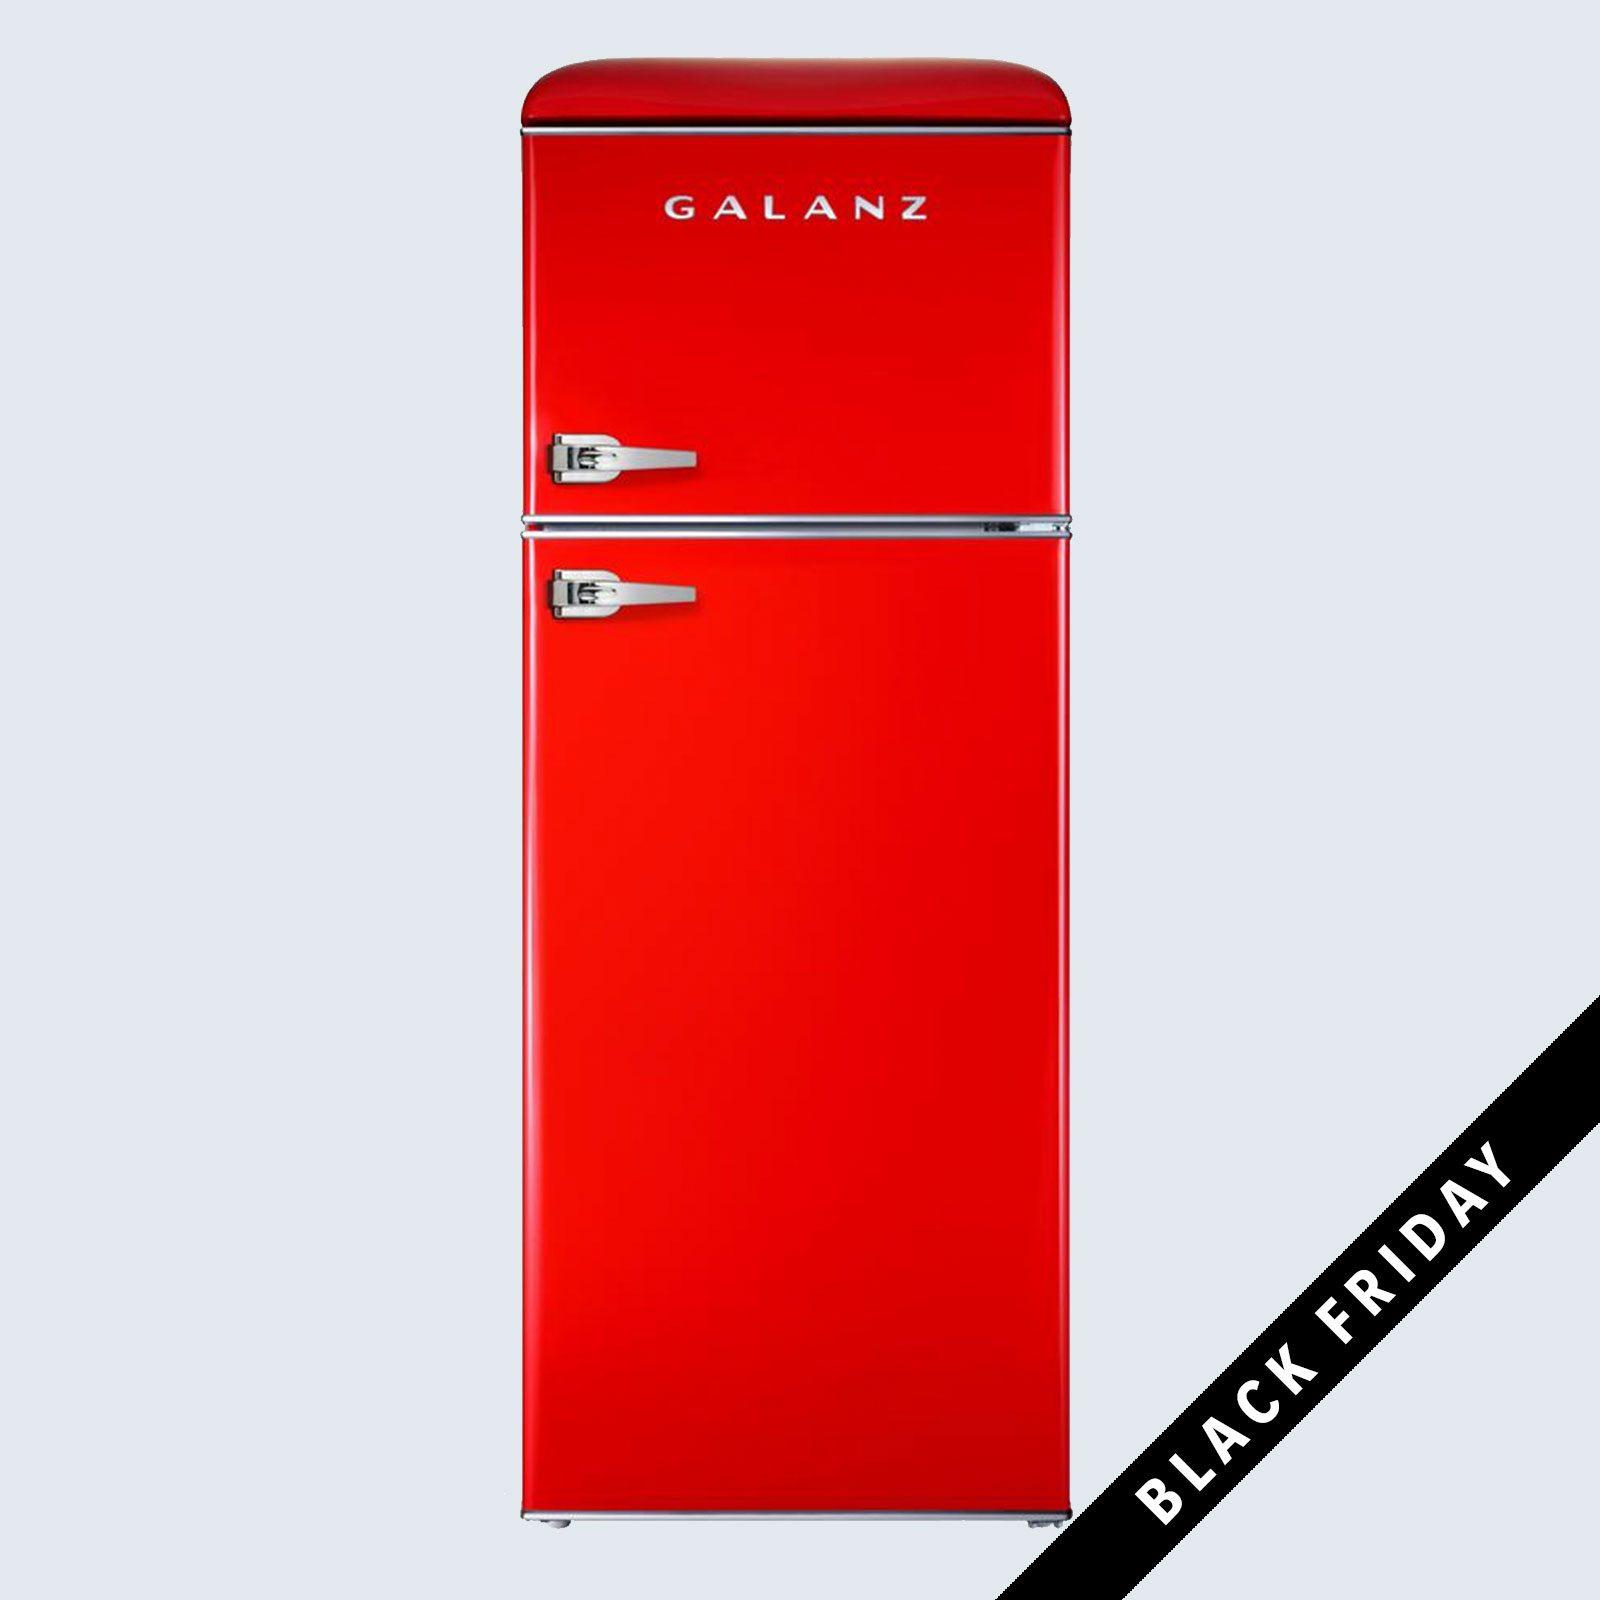 Galanz Retro Mini Refrigerator